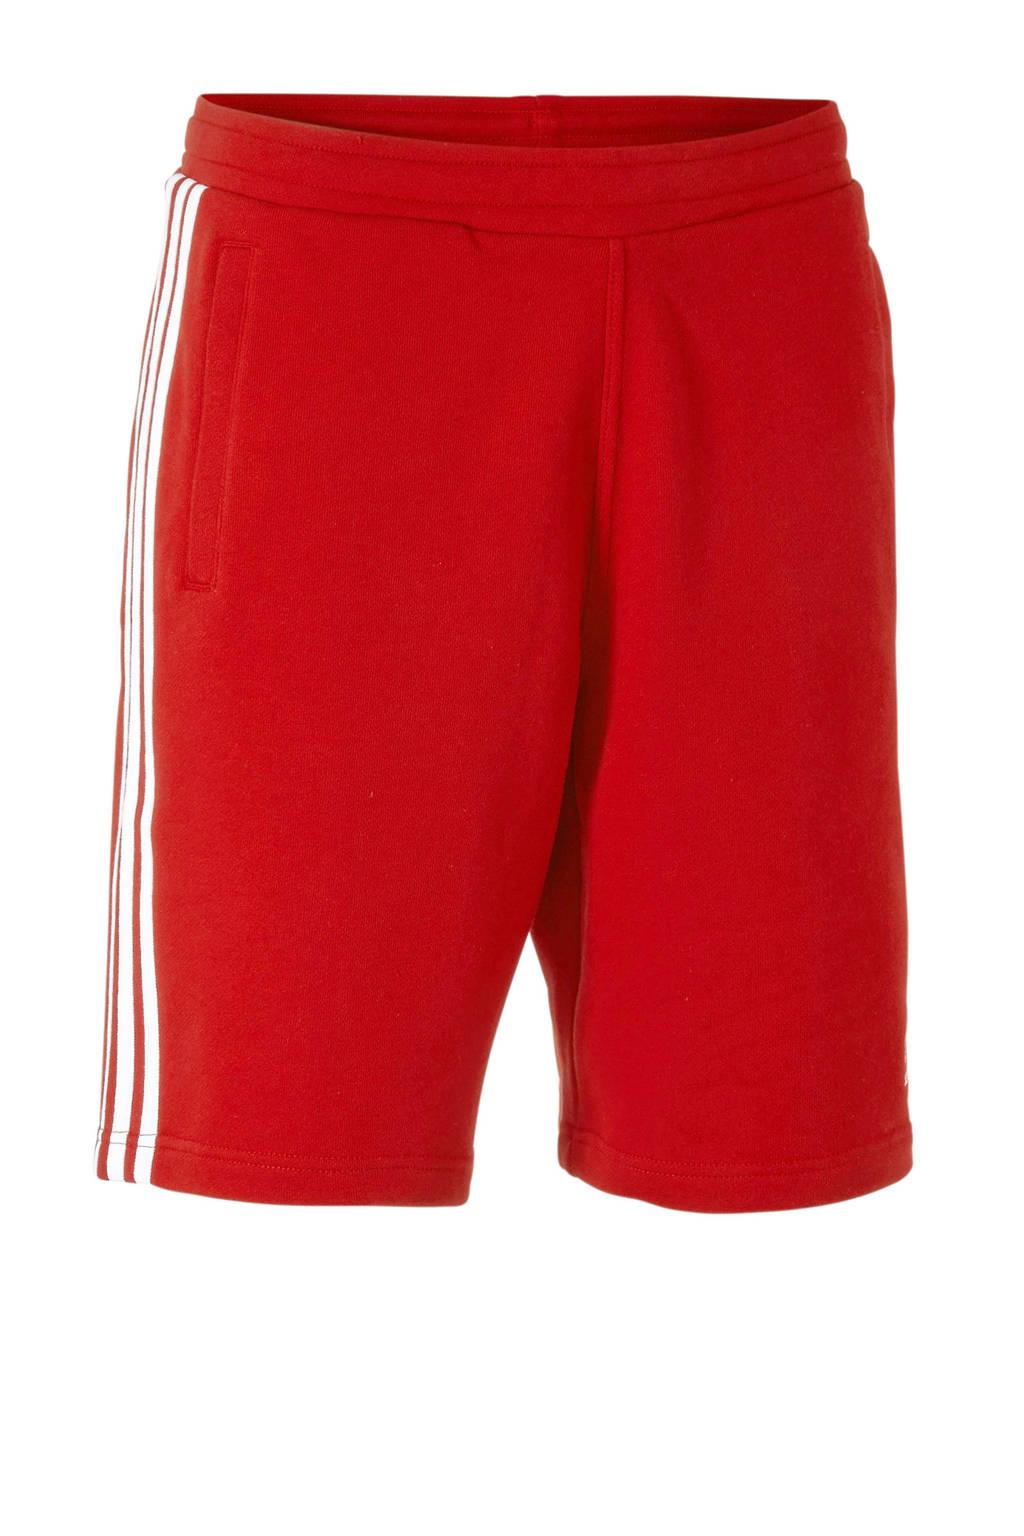 adidas originals   sweatshort rood, Rood